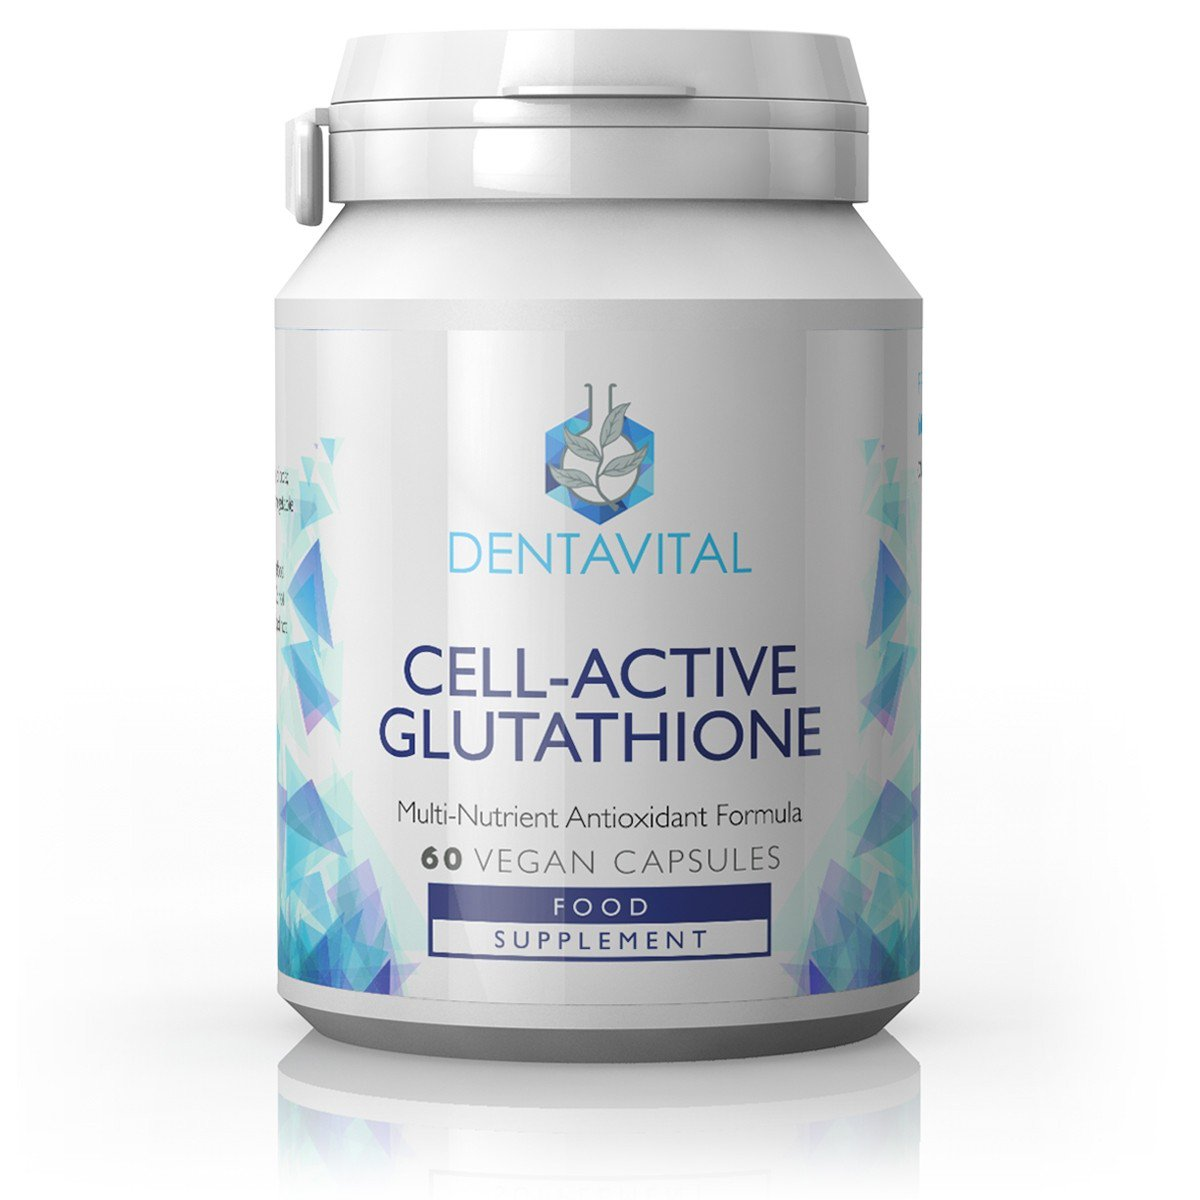 Dentavital Cell-Active Glutathione 60's